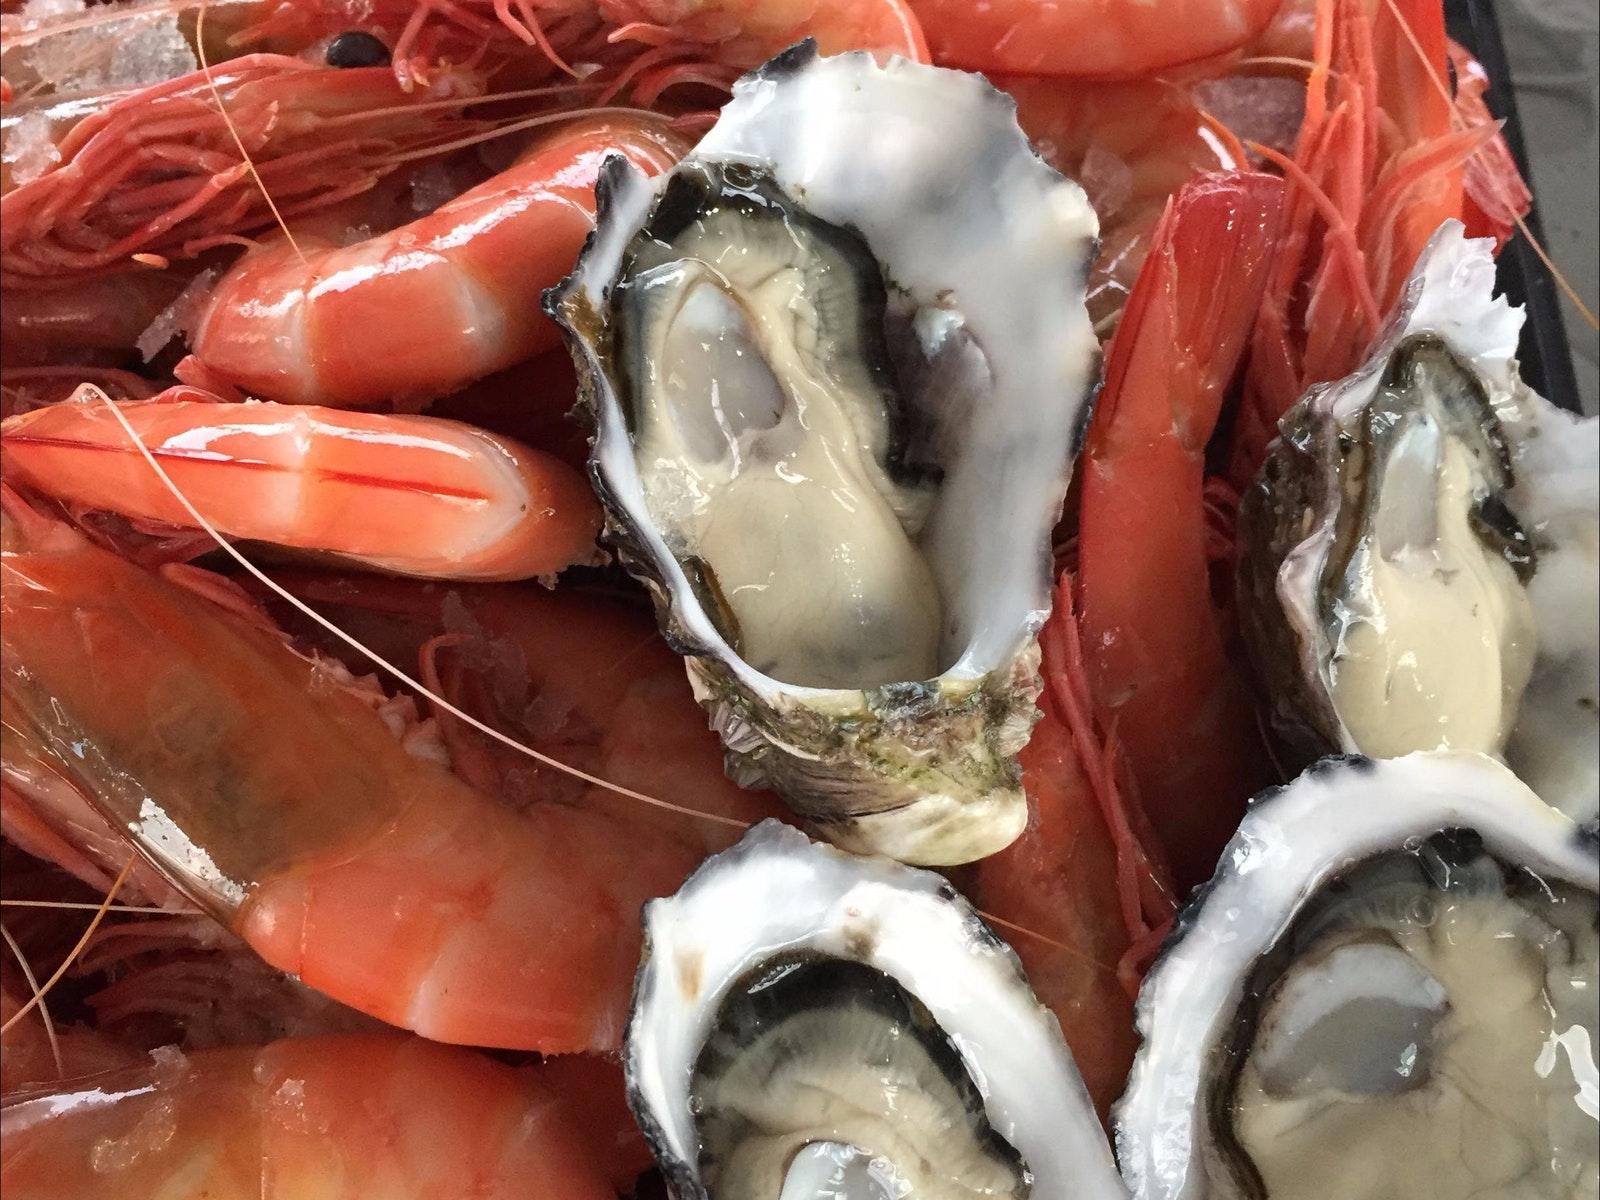 Beautiful fresh prawns and mussels